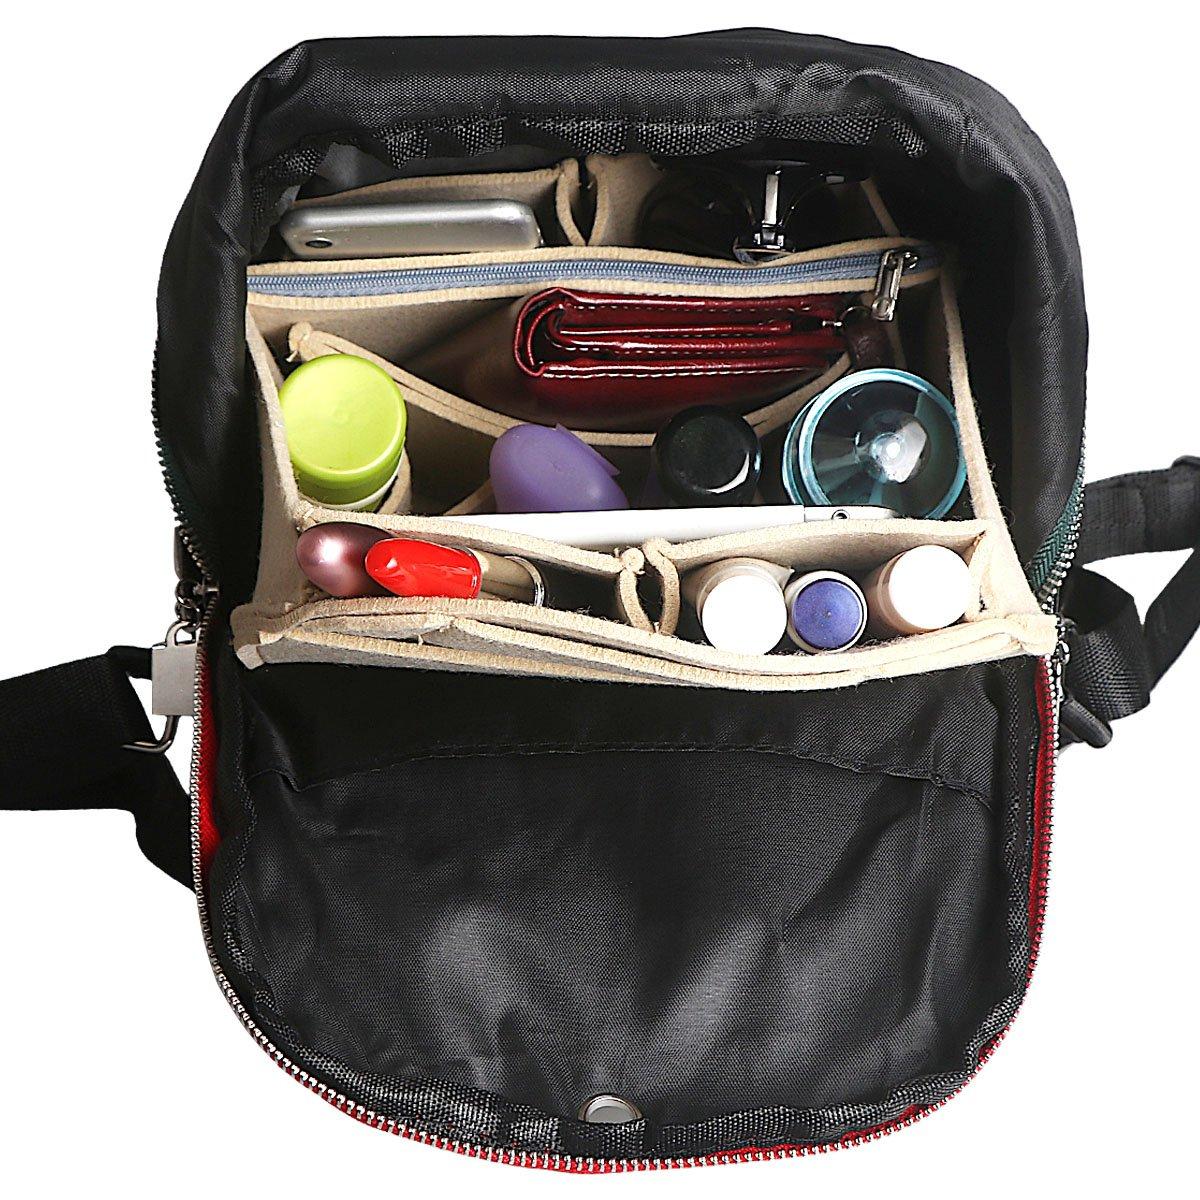 xhorizon SR Purse Organizer Insert Purse Handbag Tote Bag,Bag in Bag Organizer by xhorizon (Image #6)